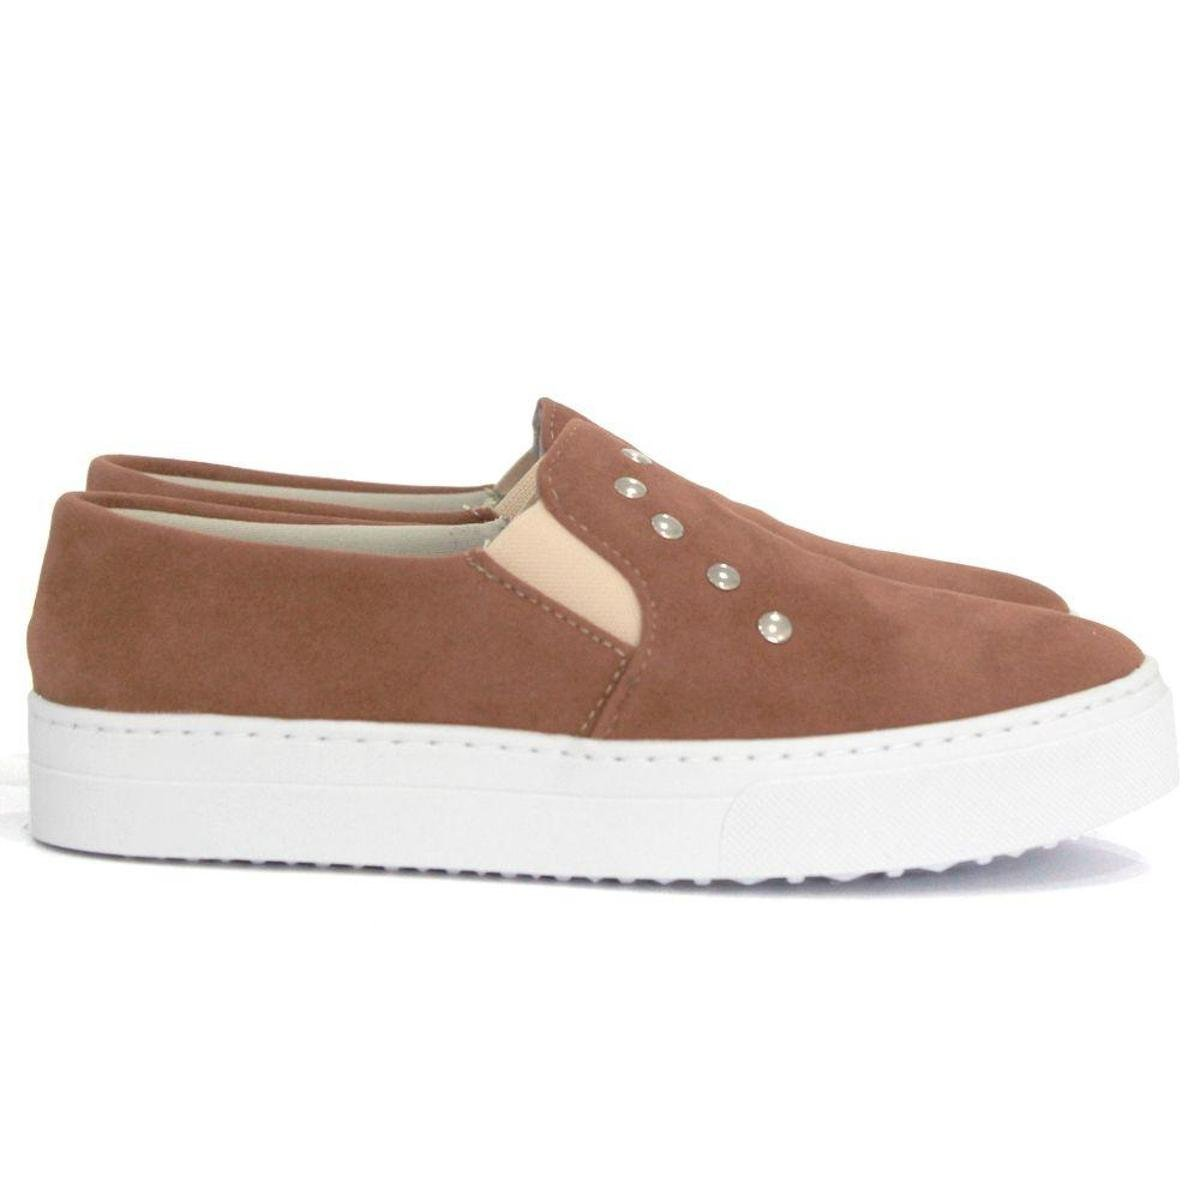 Slip On Dali Shoes Metais Feminino - Marrom